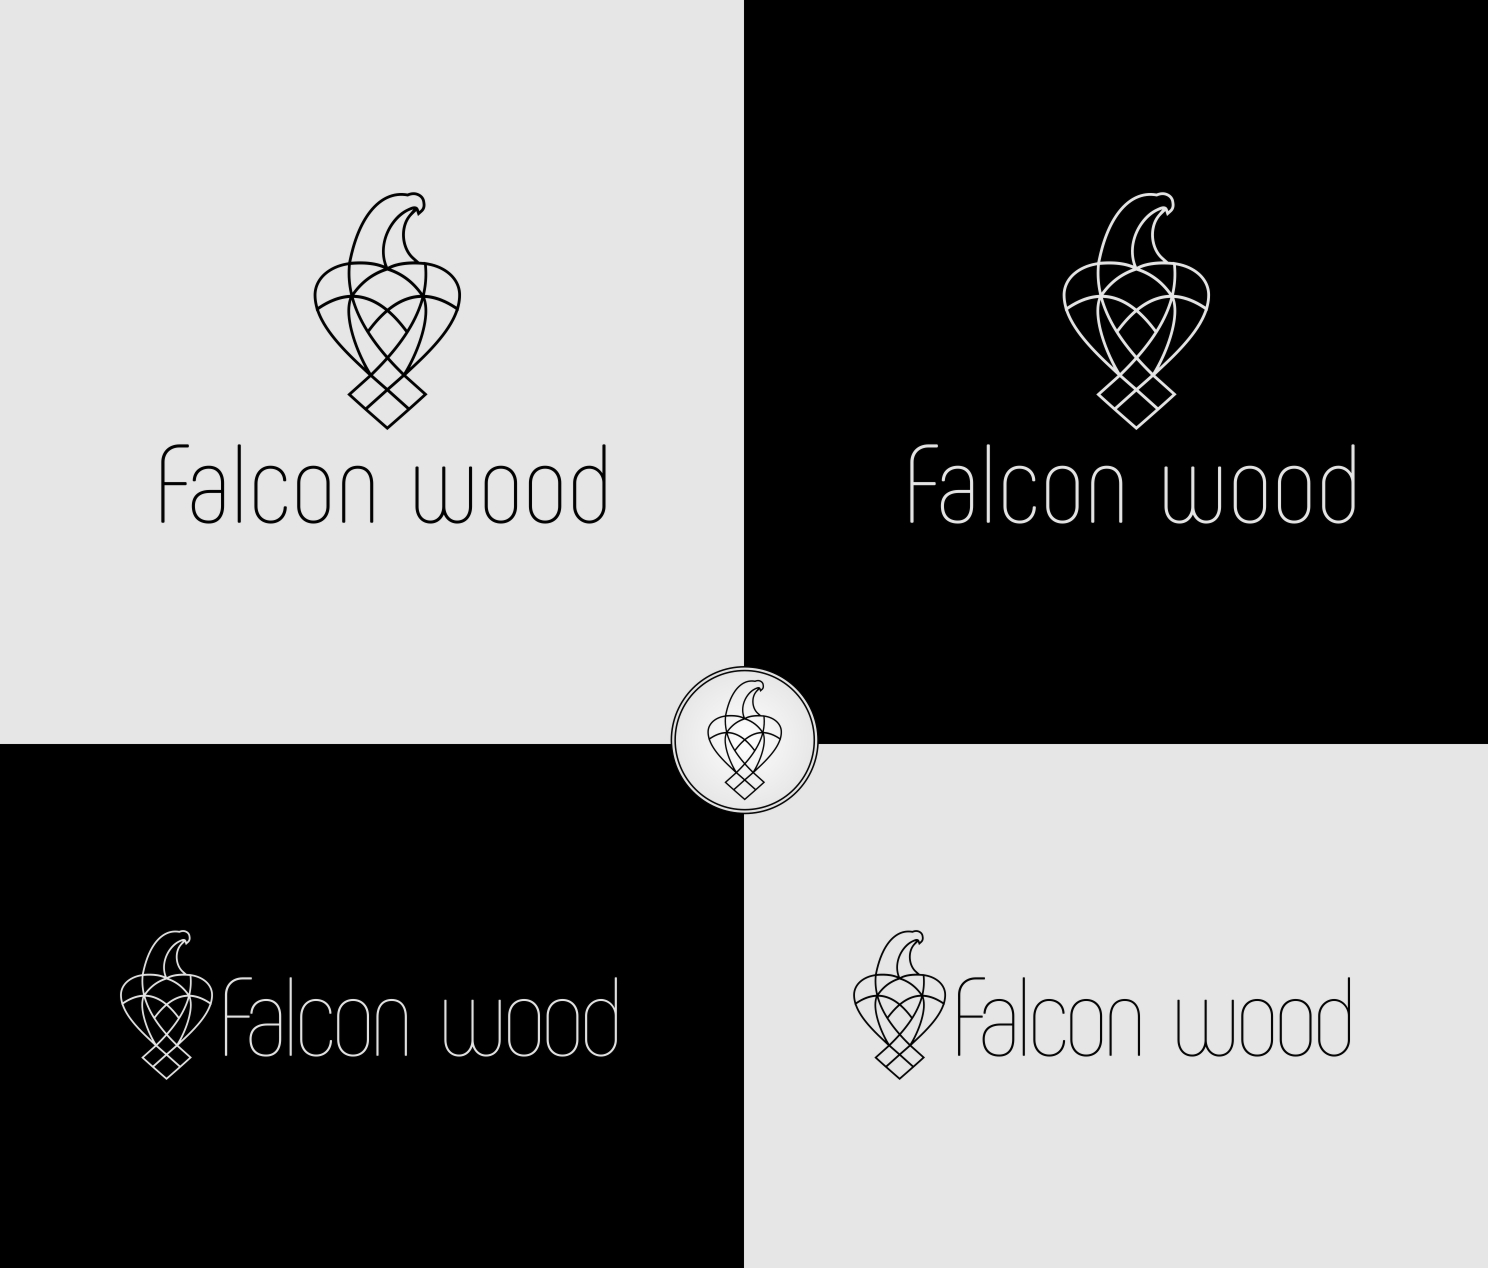 Дизайн логотипа столярной мастерской фото f_9425cff94e4a42ba.jpg